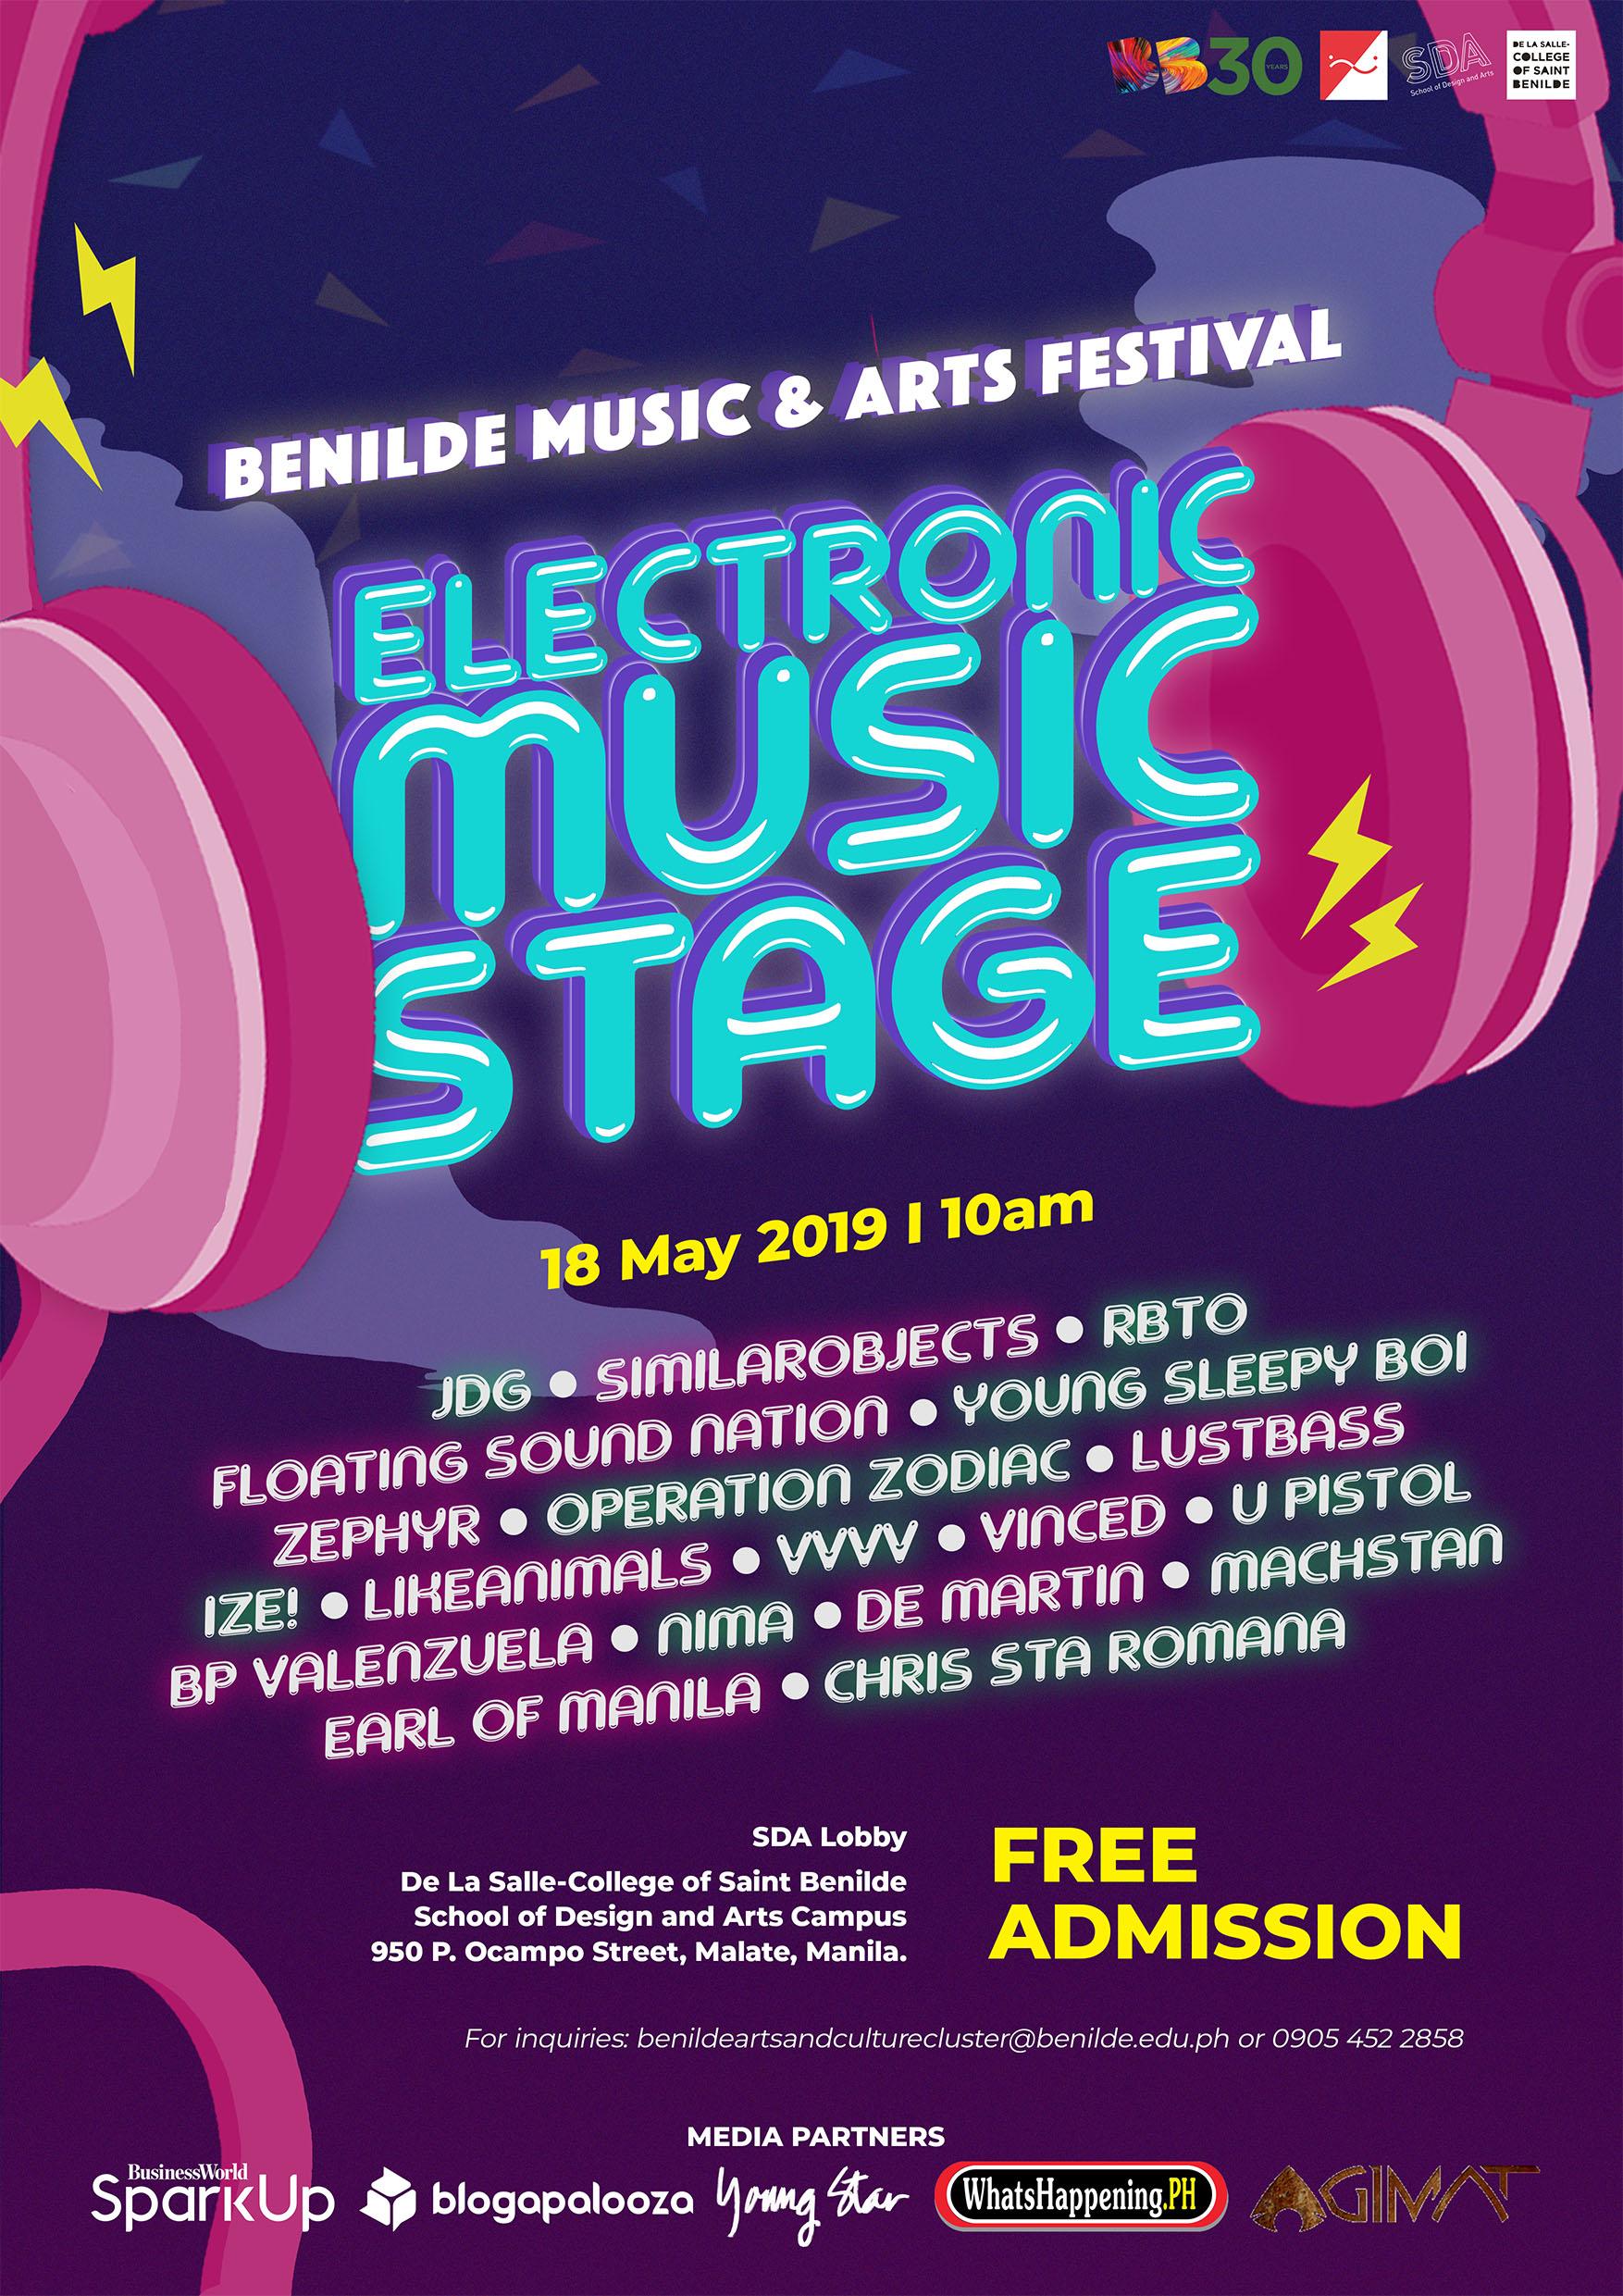 Benilde's Music and Arts Festival | Agimat: Sining at